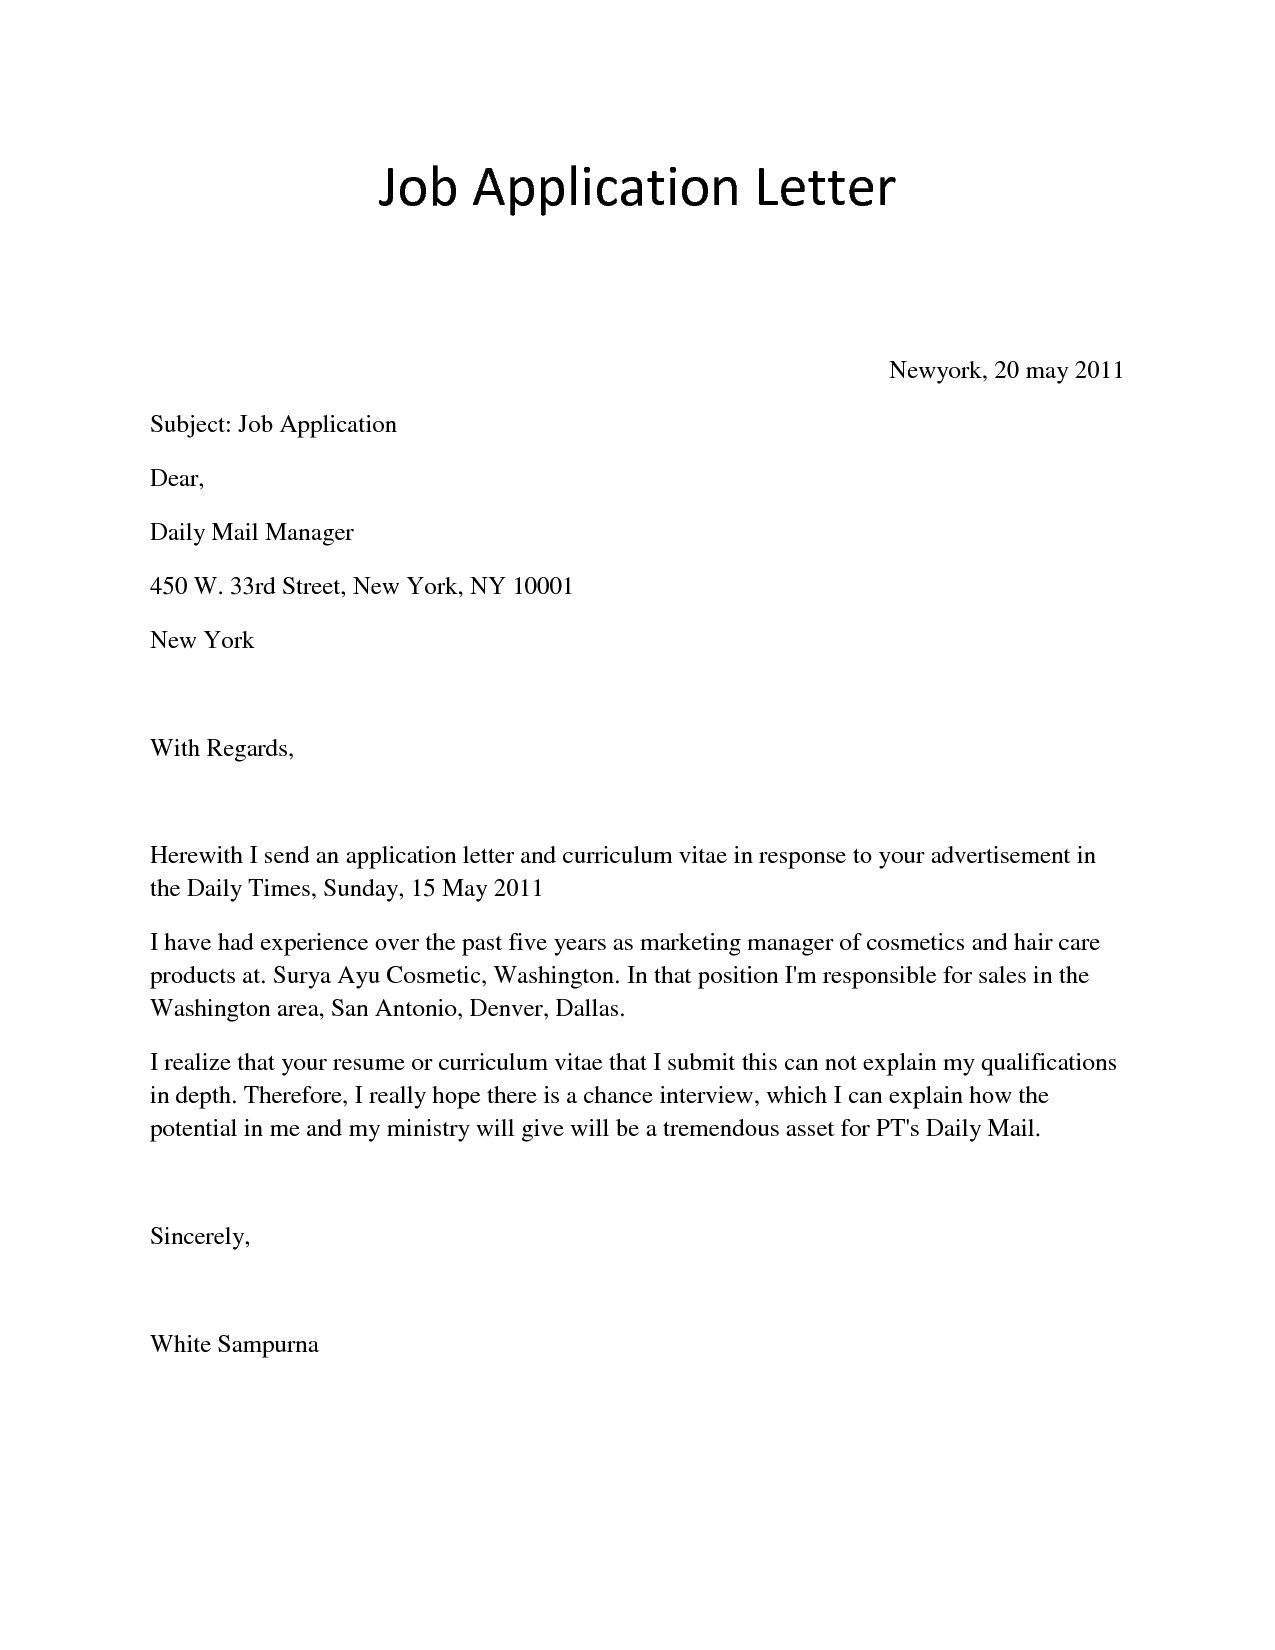 Simple Job Application Letter Application Letter Sample Application Lett In 2020 Job Cover Letter Simple Job Application Letter Application Letter For Employment